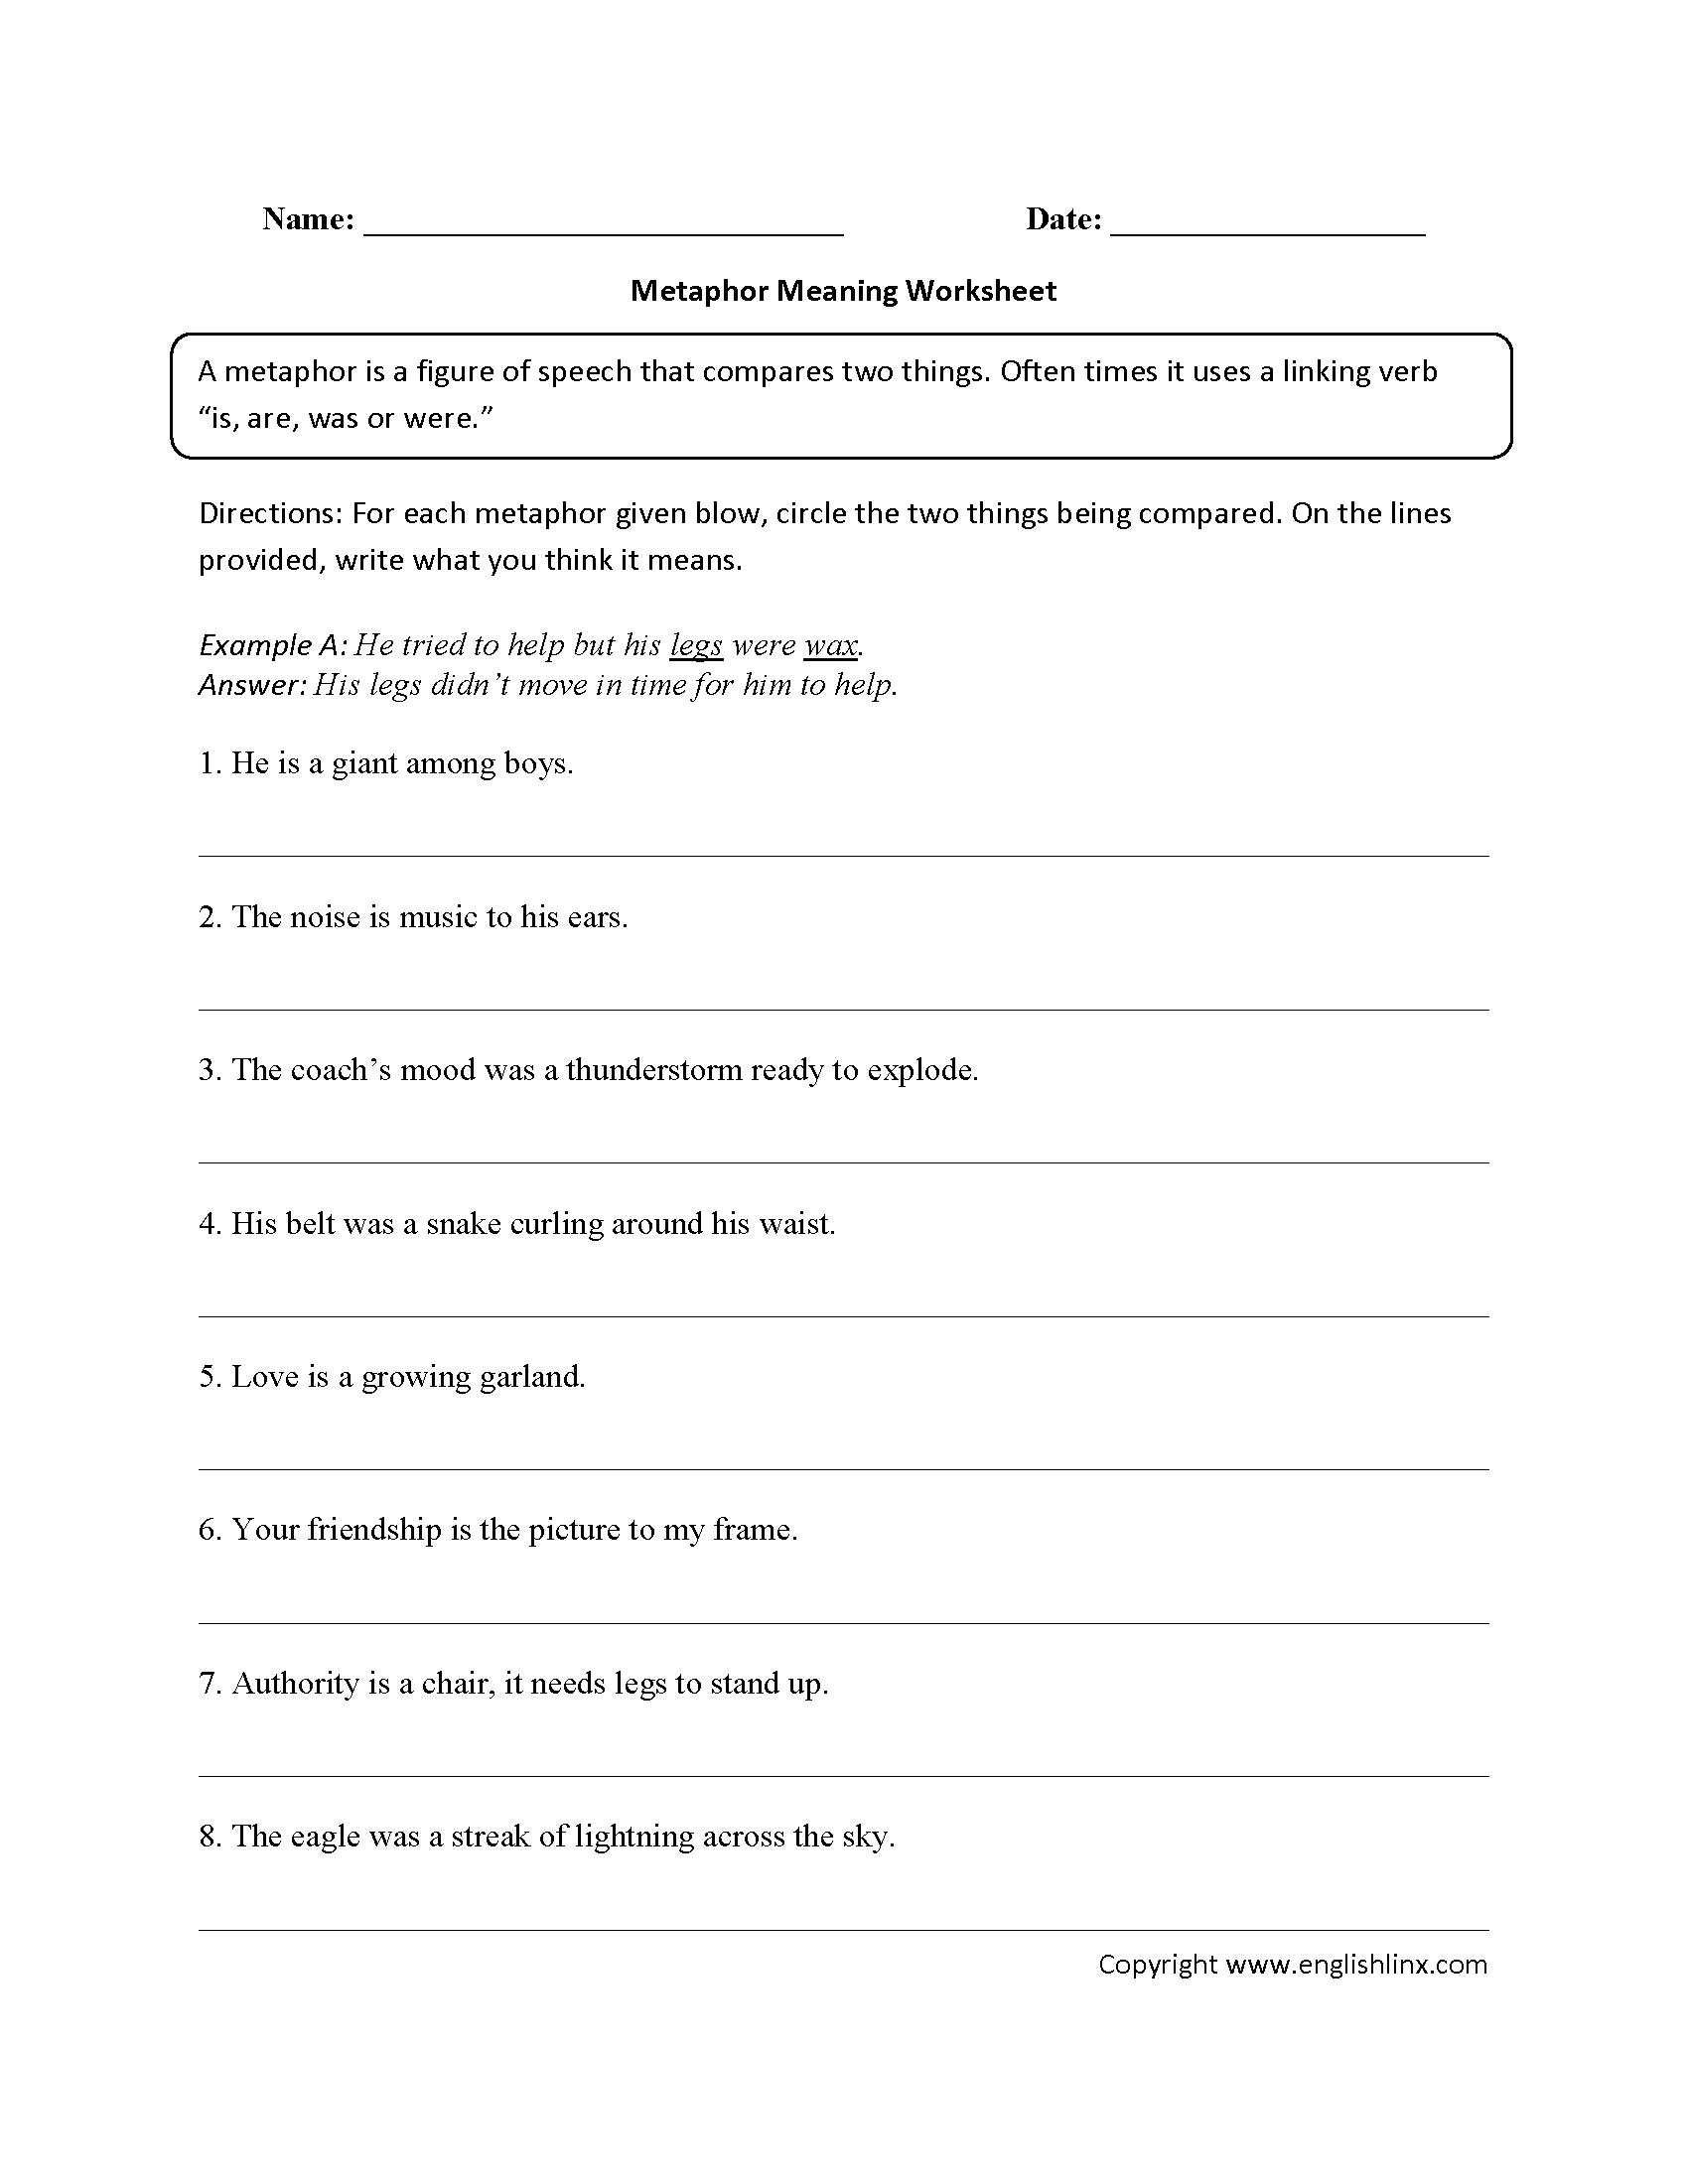 Metaphors Worksheets